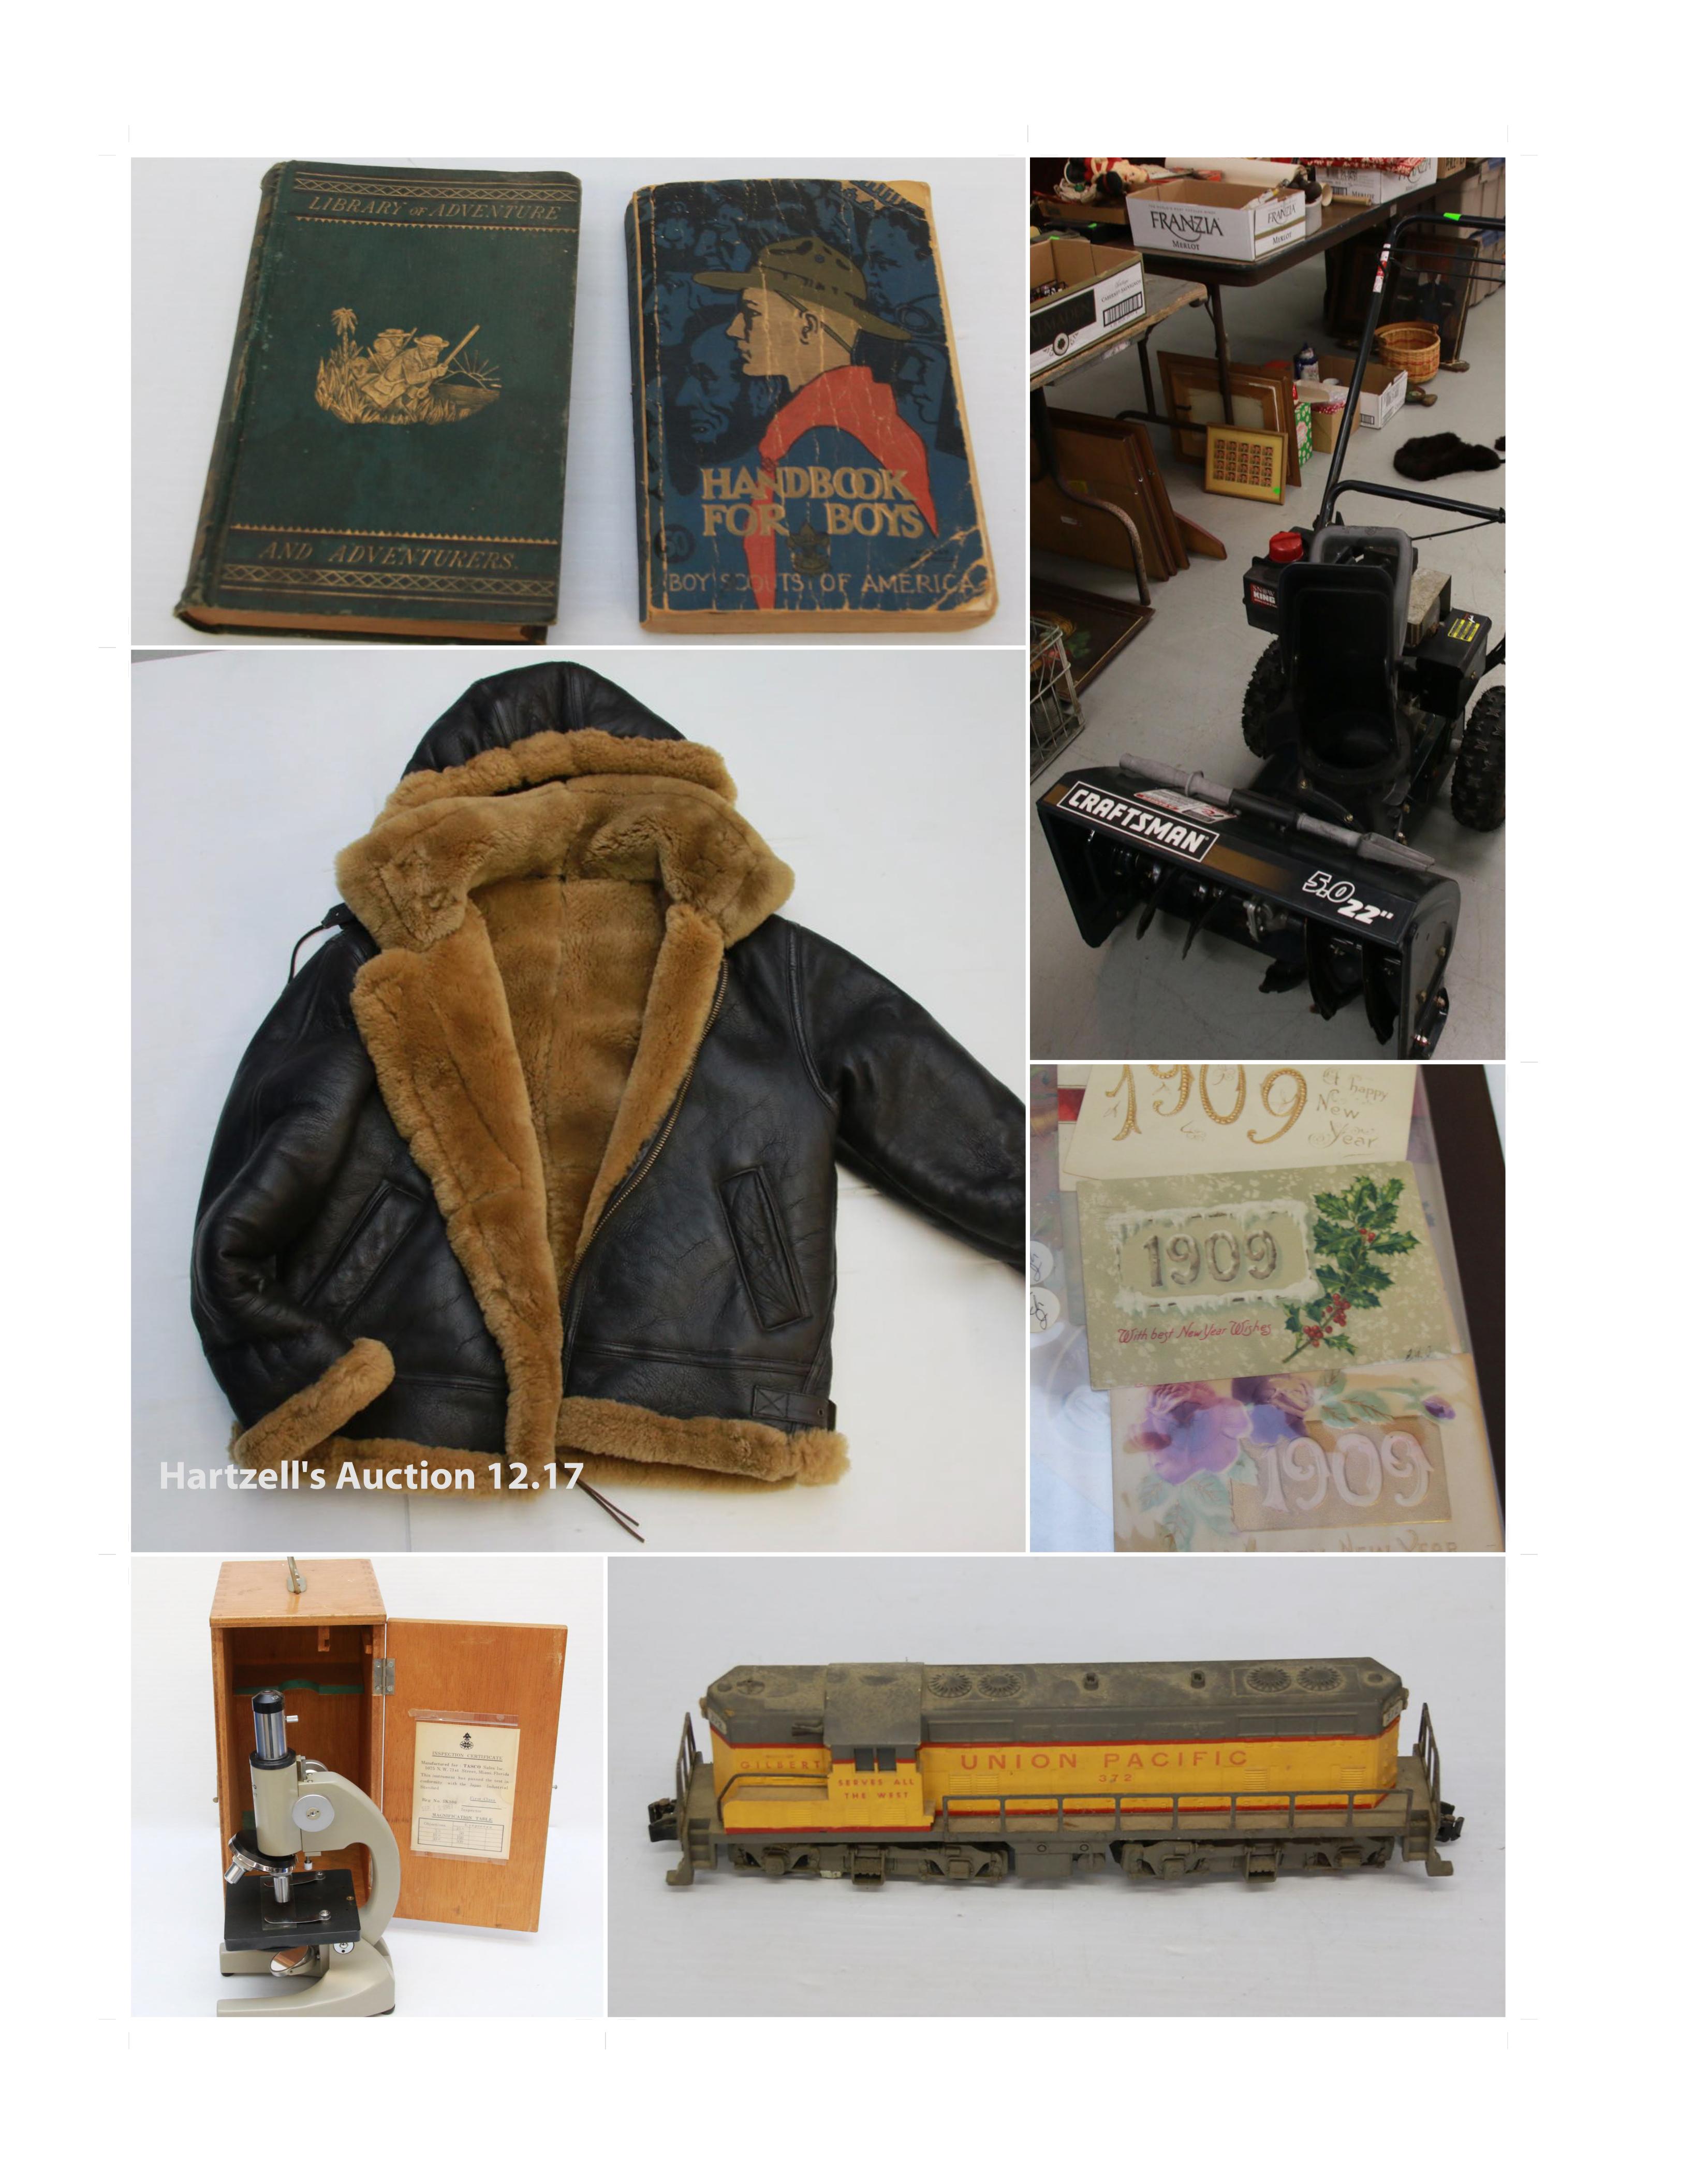 Tools, Trains, Restaurant Items, & More….